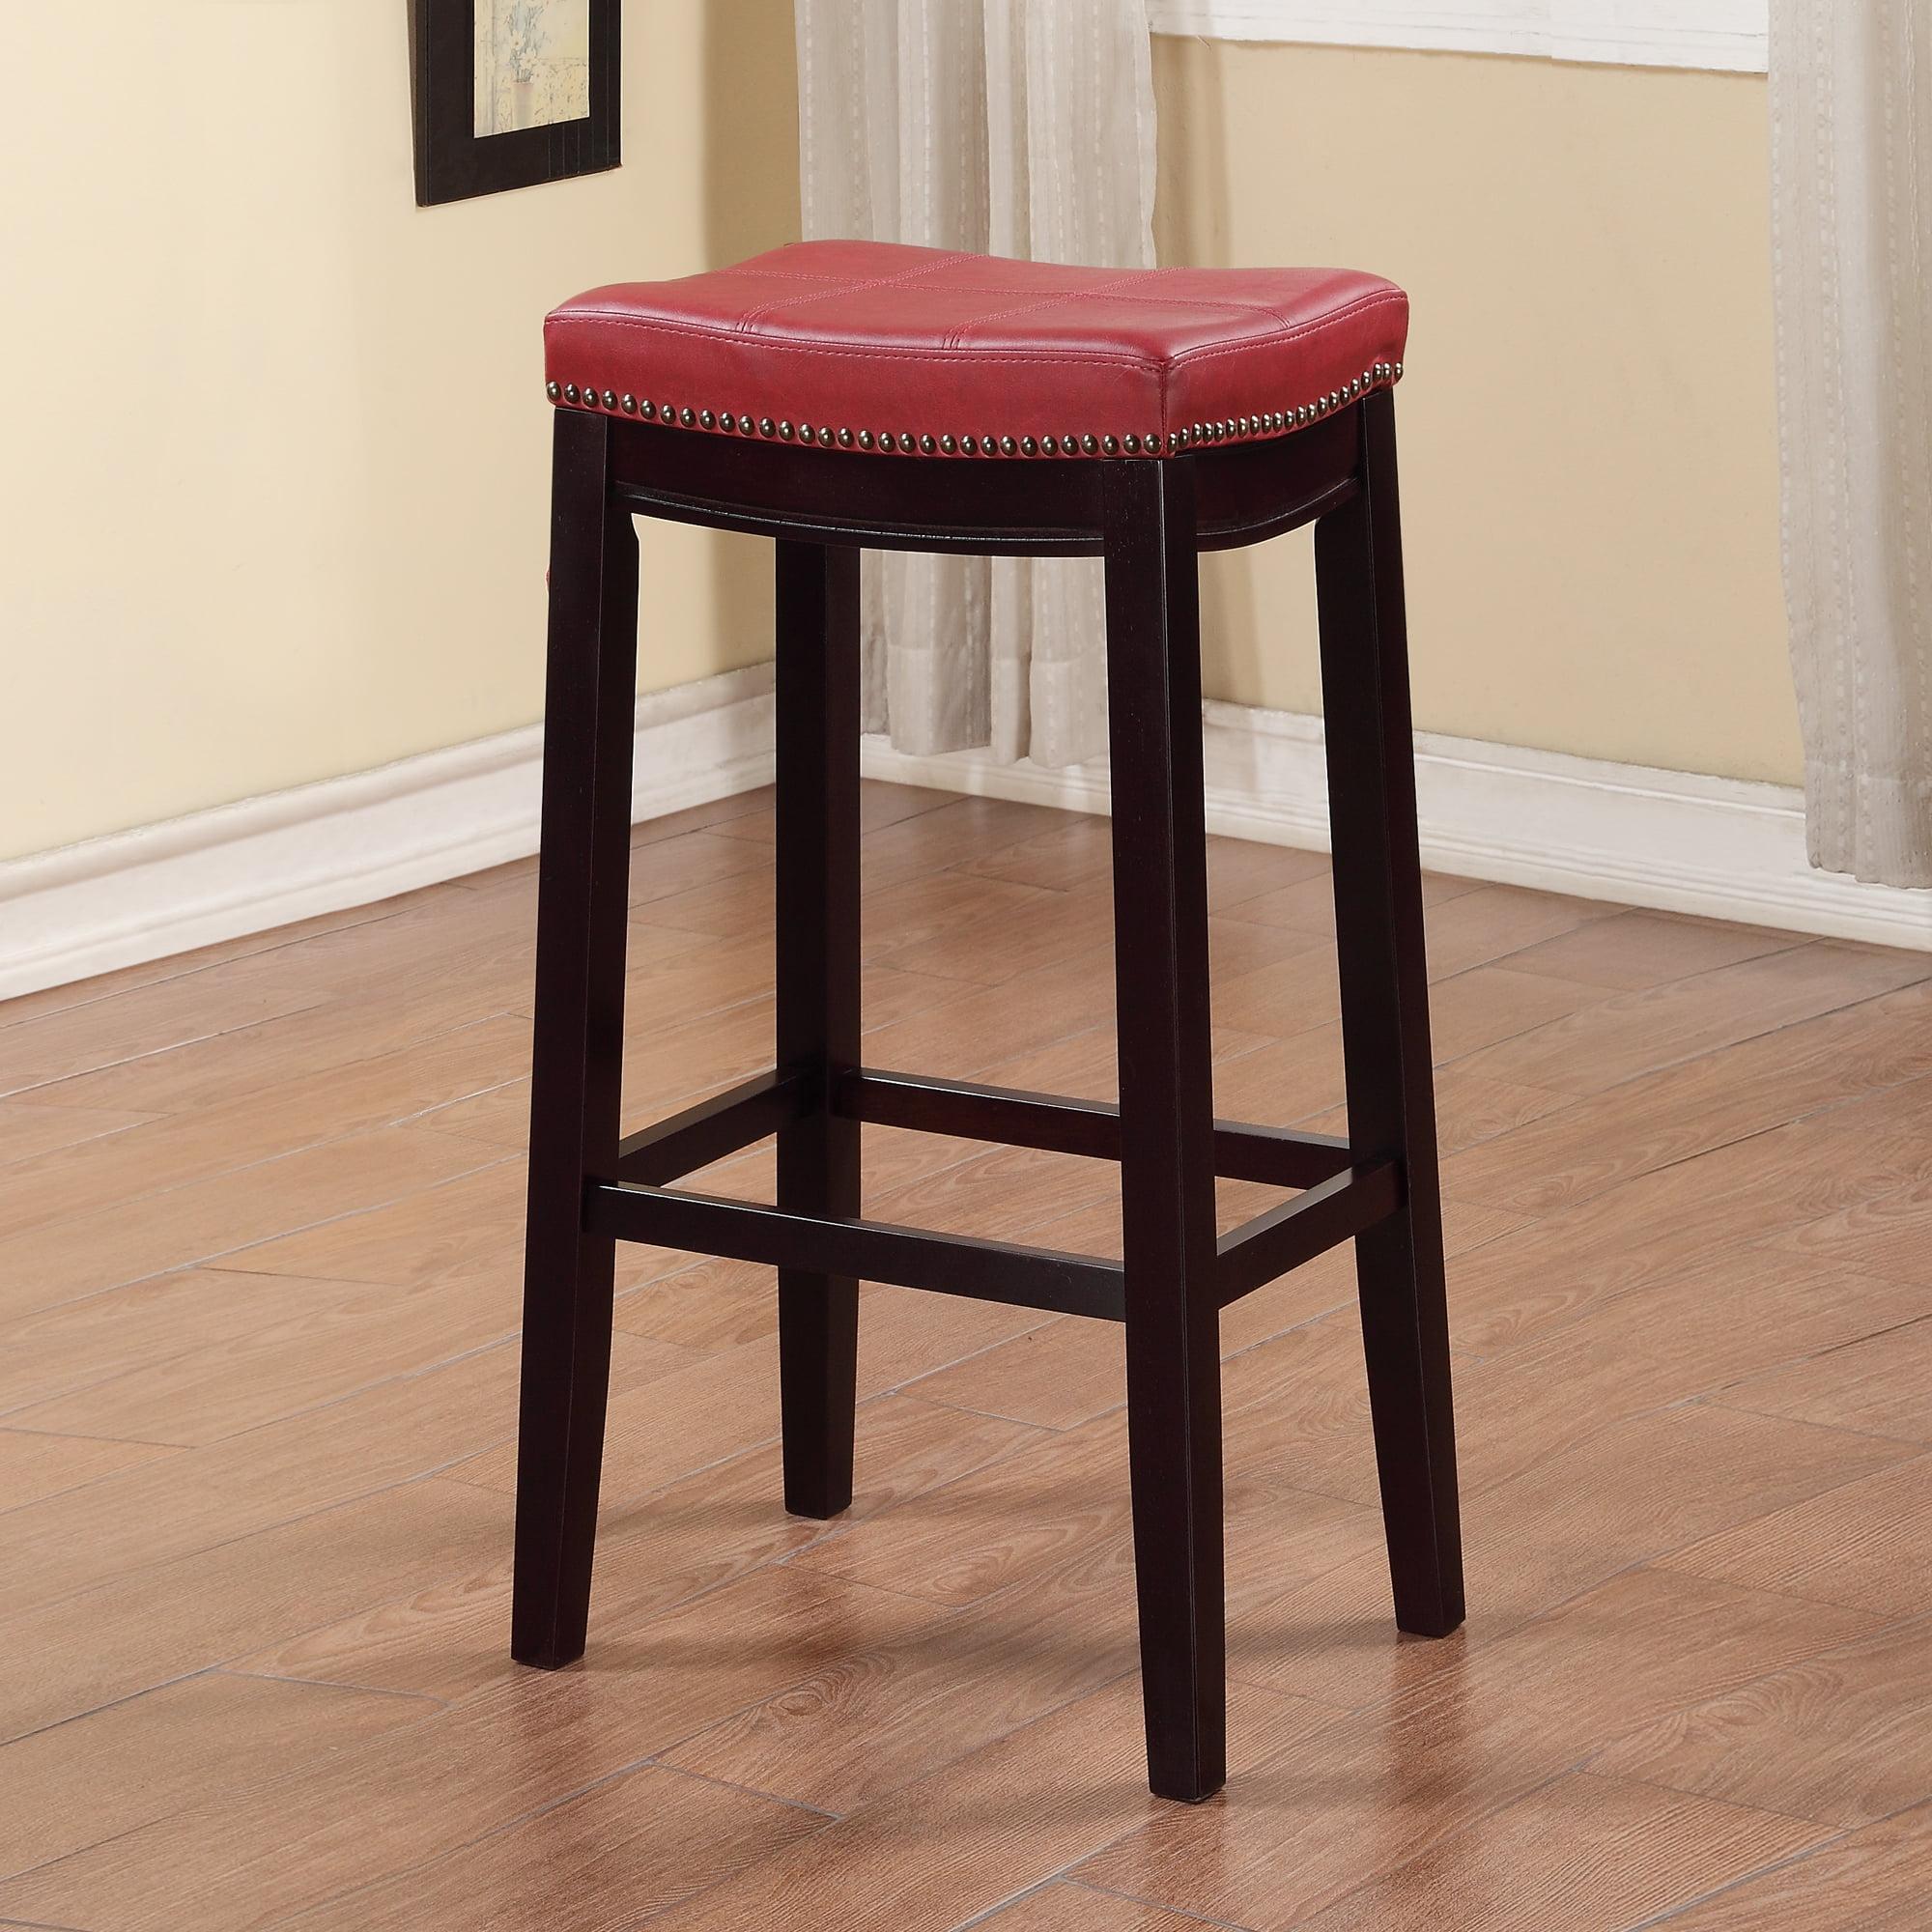 Linon Claridge Bar Stool 32 Inch Seat Height Multiple